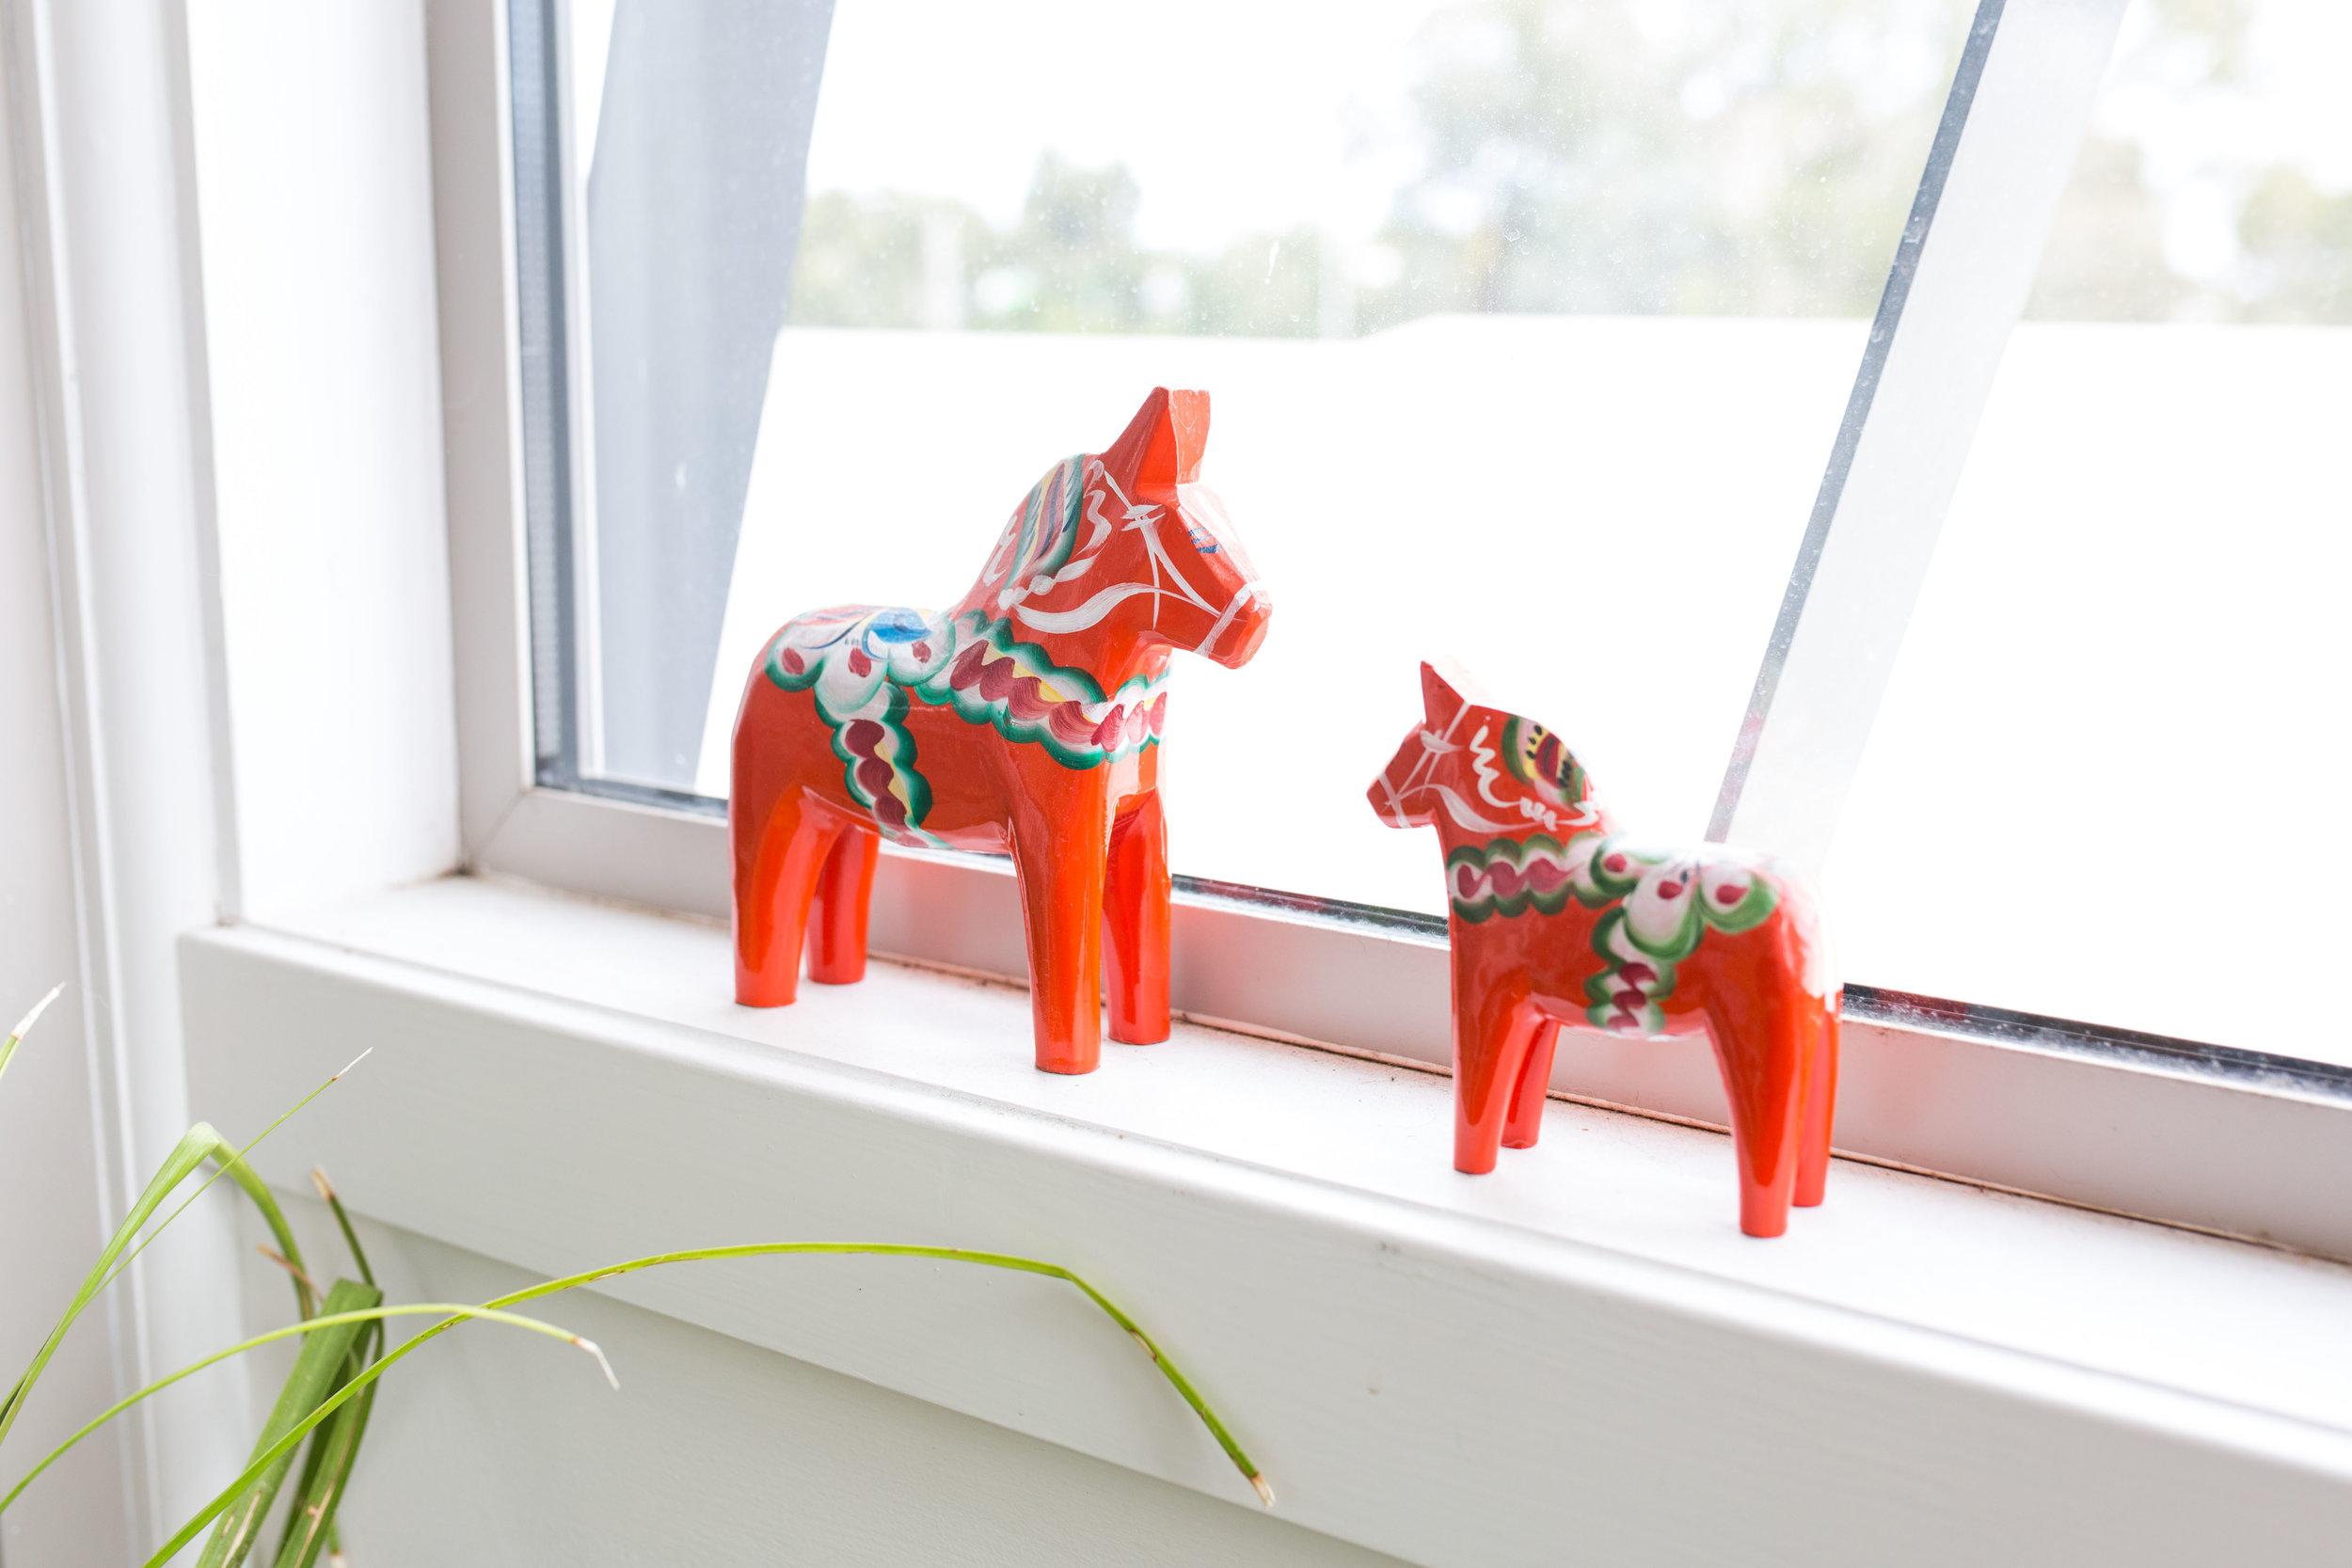 Emily Boutard, Simon McKenzie & Patrick Darby - Rented Space. Swedish Dala horses